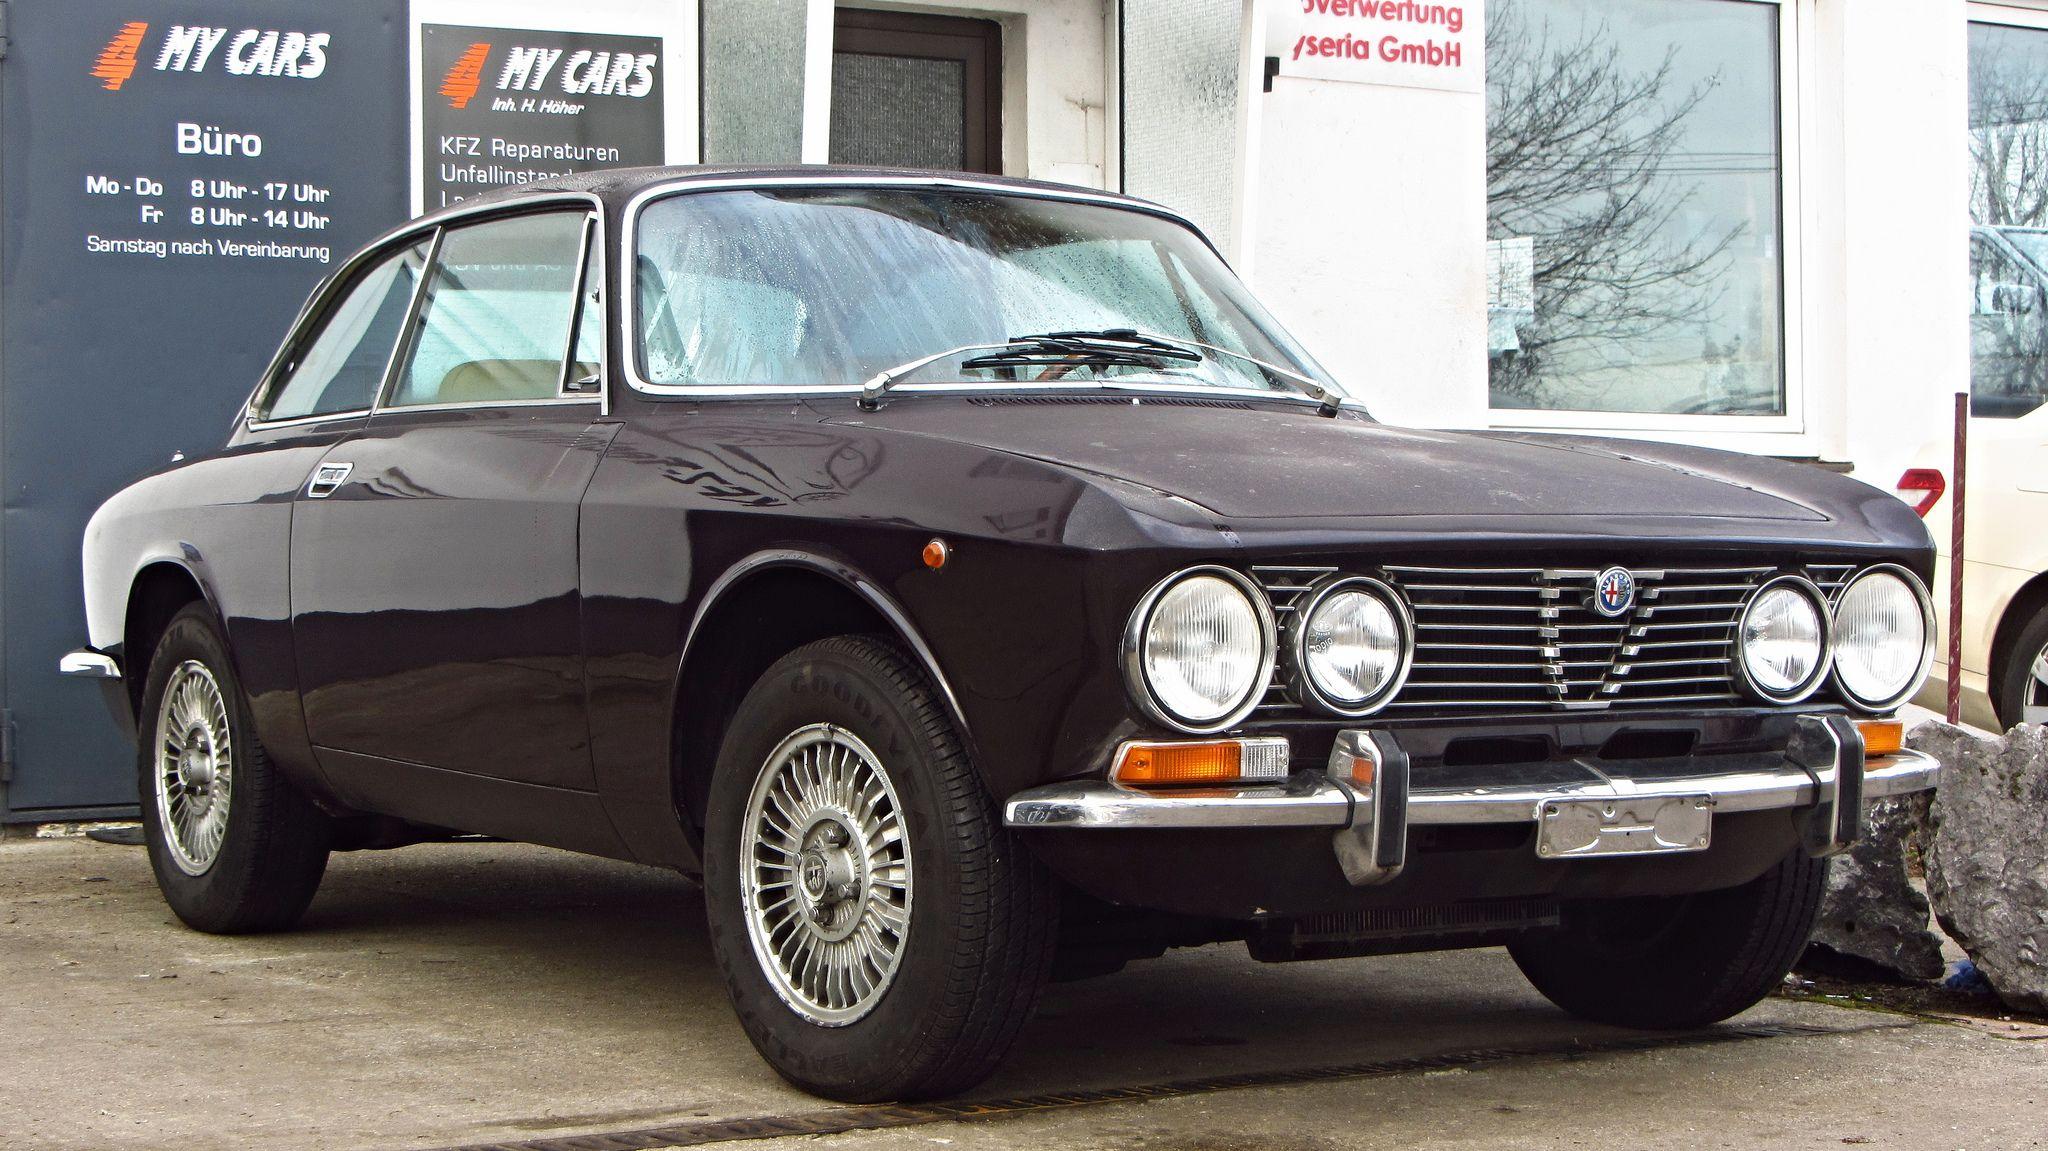 Alfa romeo 1750 gtv car classics - Https Flic Kr P Dhgara Alfa Romeo 1750 Gtv Alfa Romeosports Carsclassic